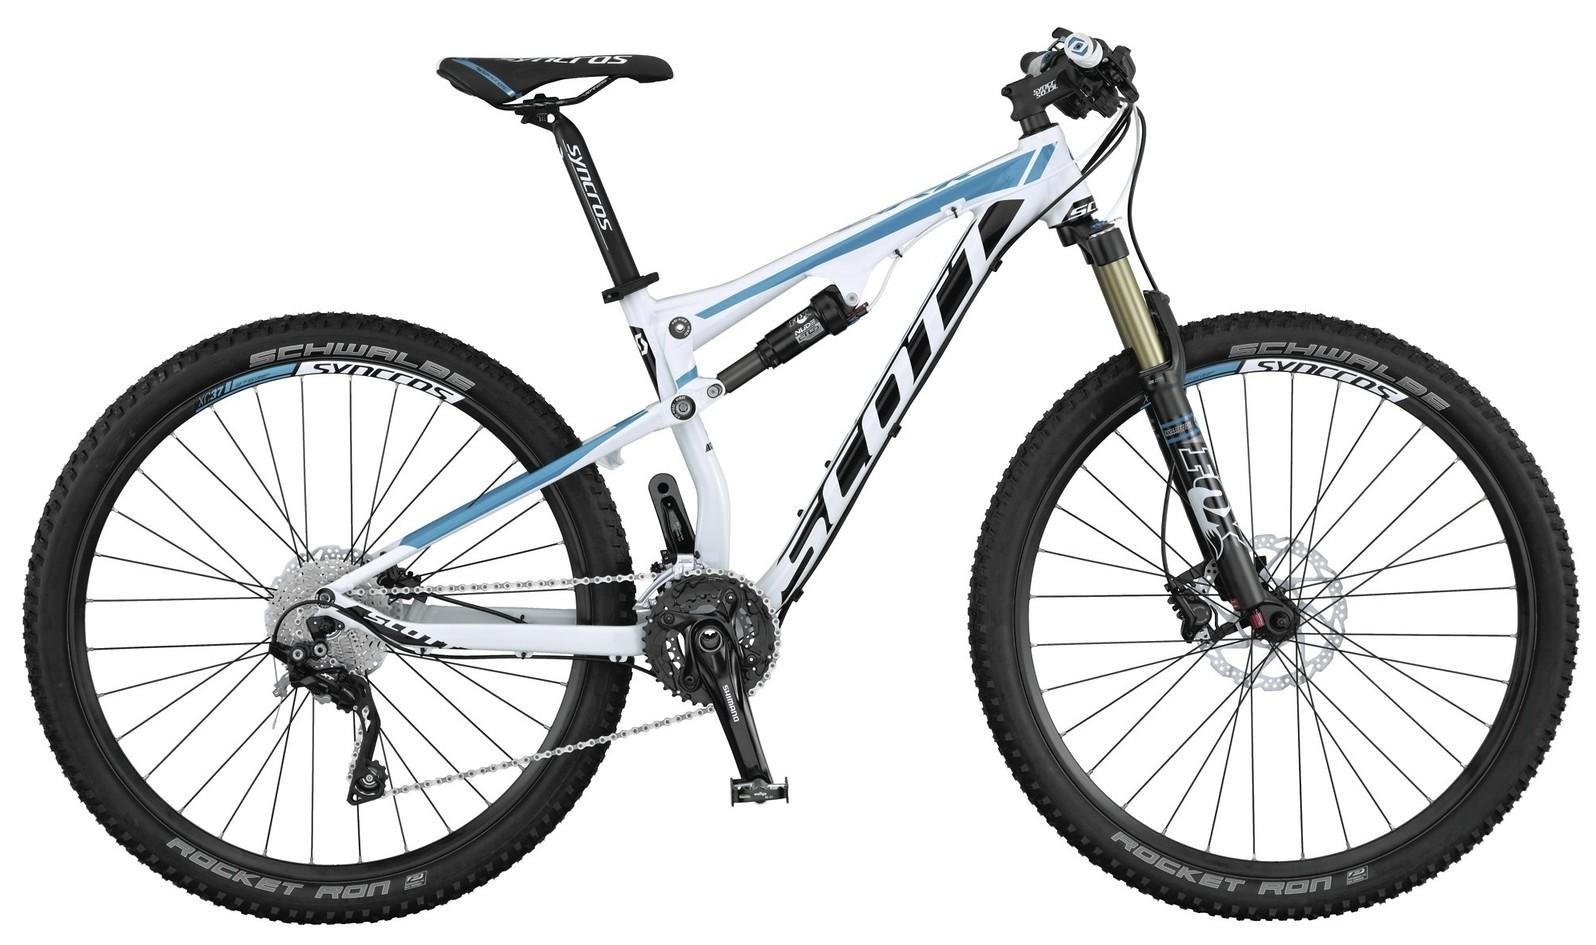 Continental Bike Tires >> 2015 Scott Contessa Spark 700 Bike - Reviews, Comparisons ...